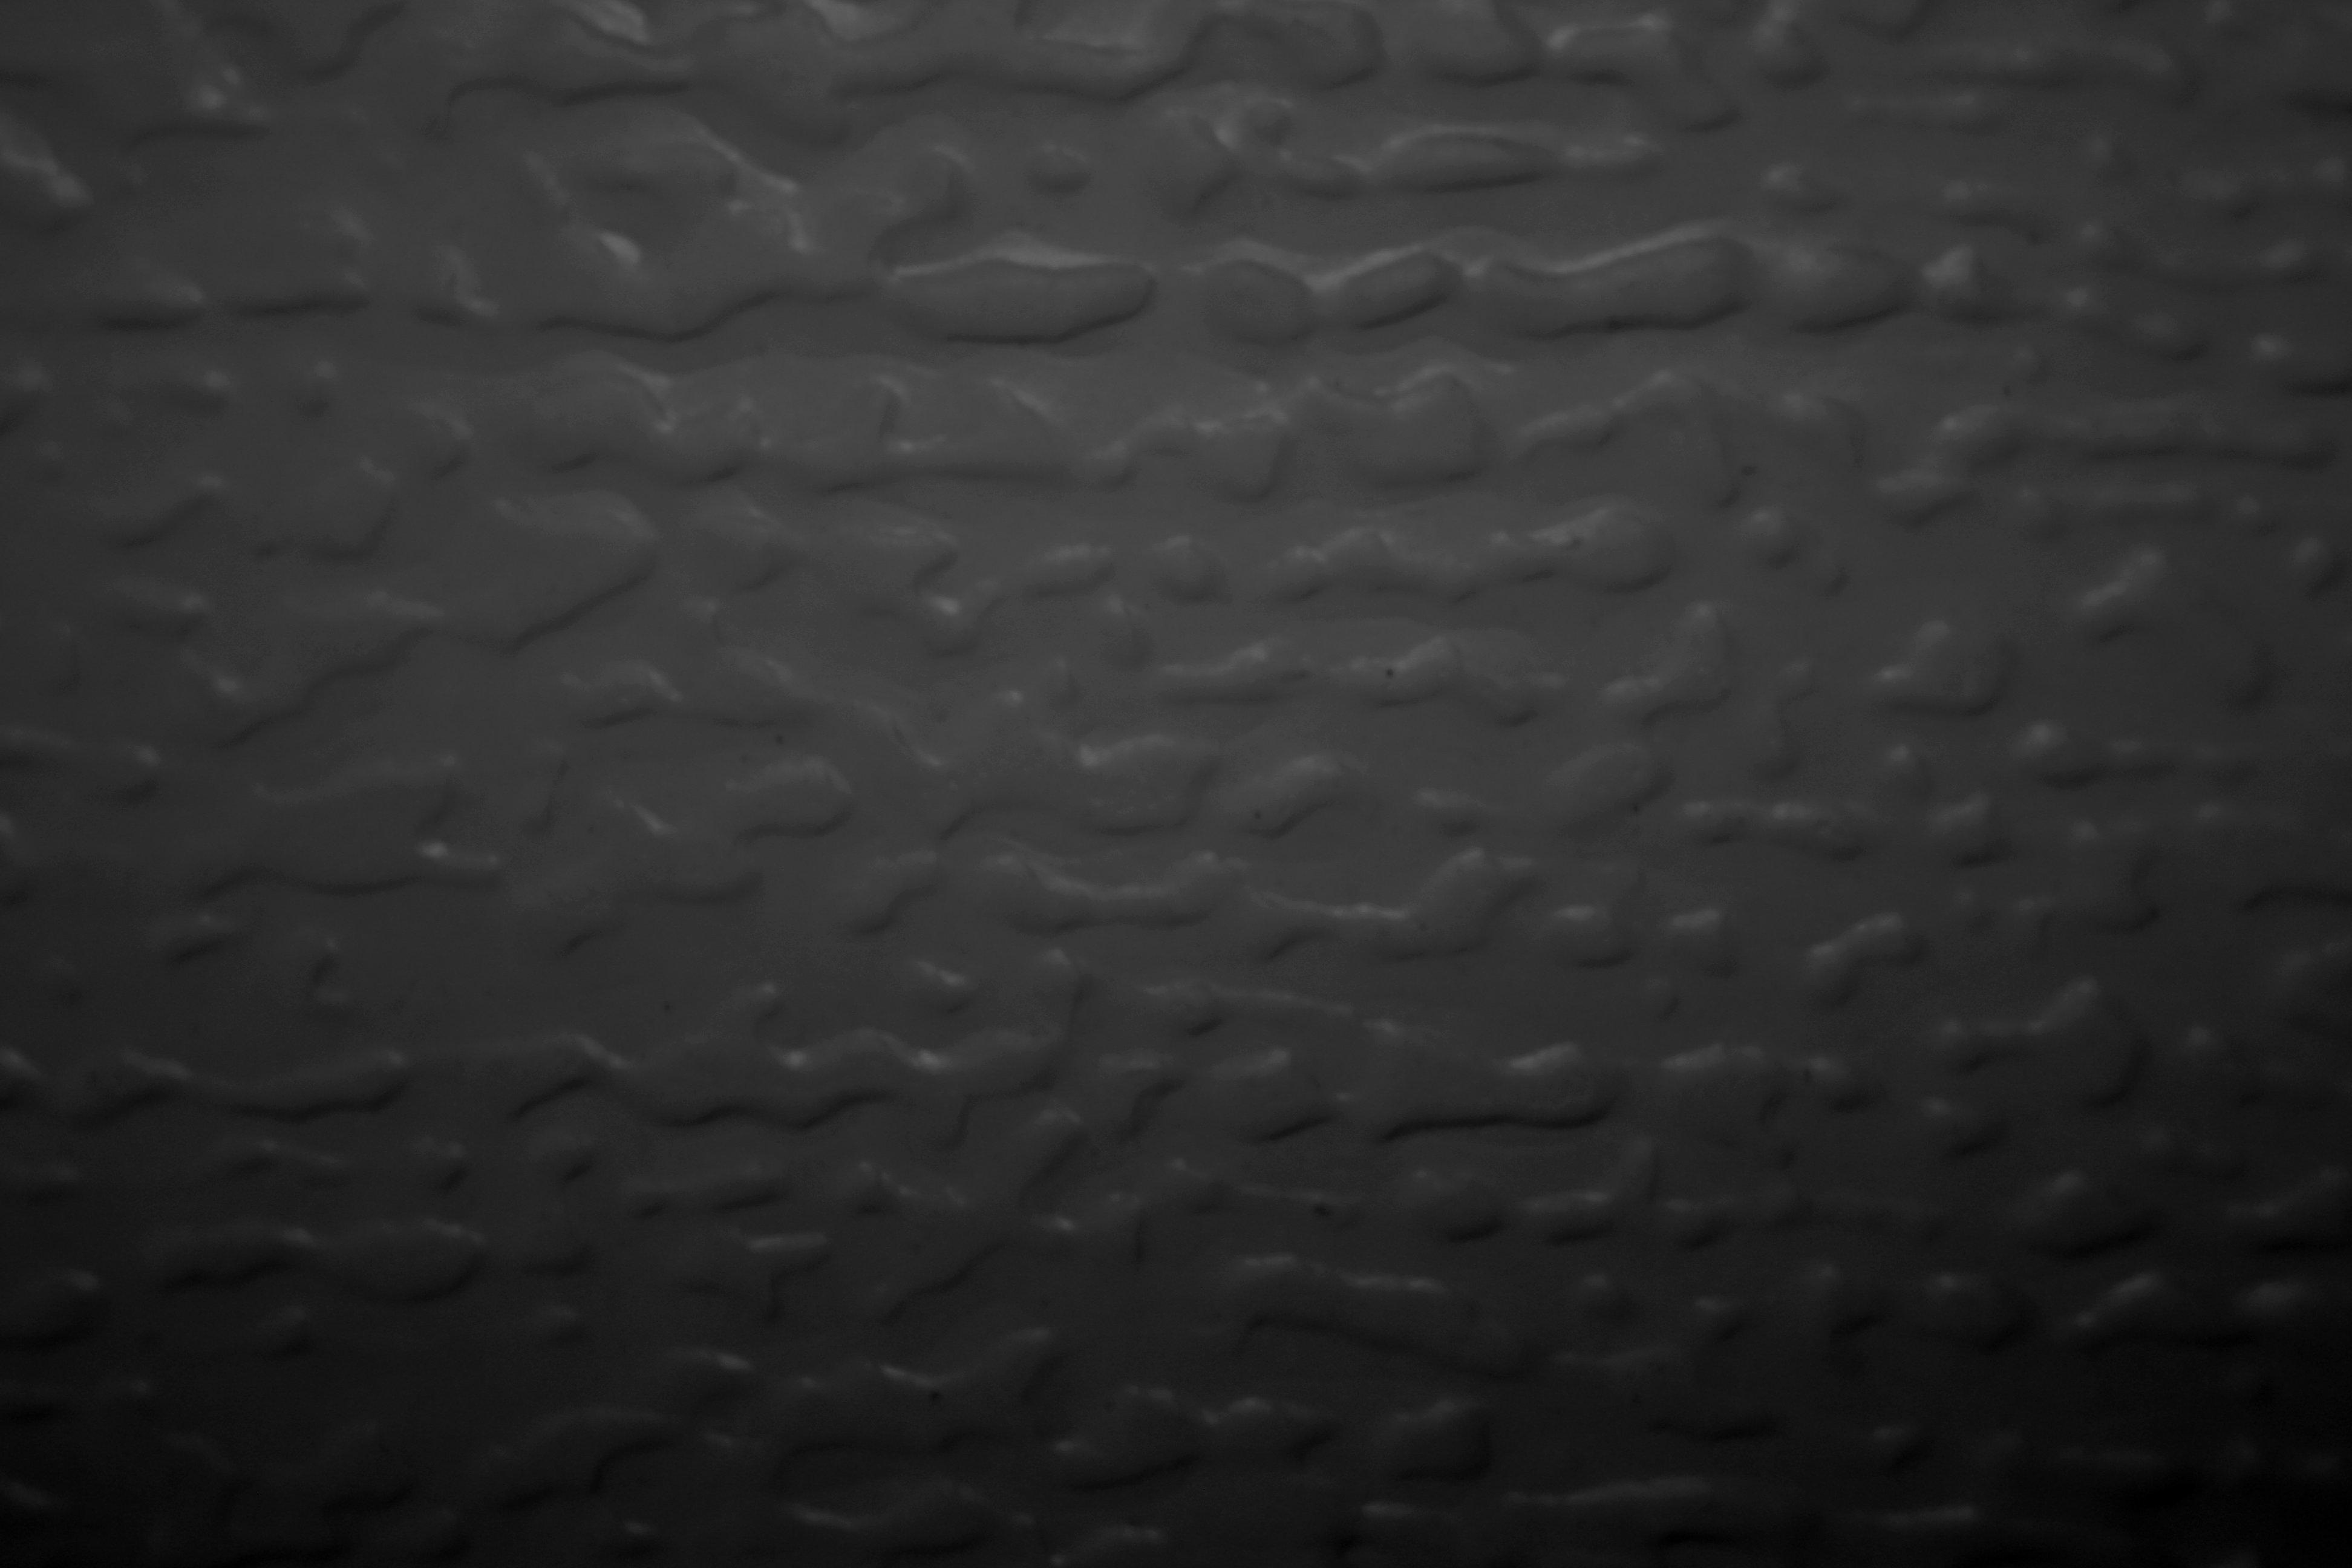 Dark Textures clipart black rubber Photos Photograph Black Plastic Plastic